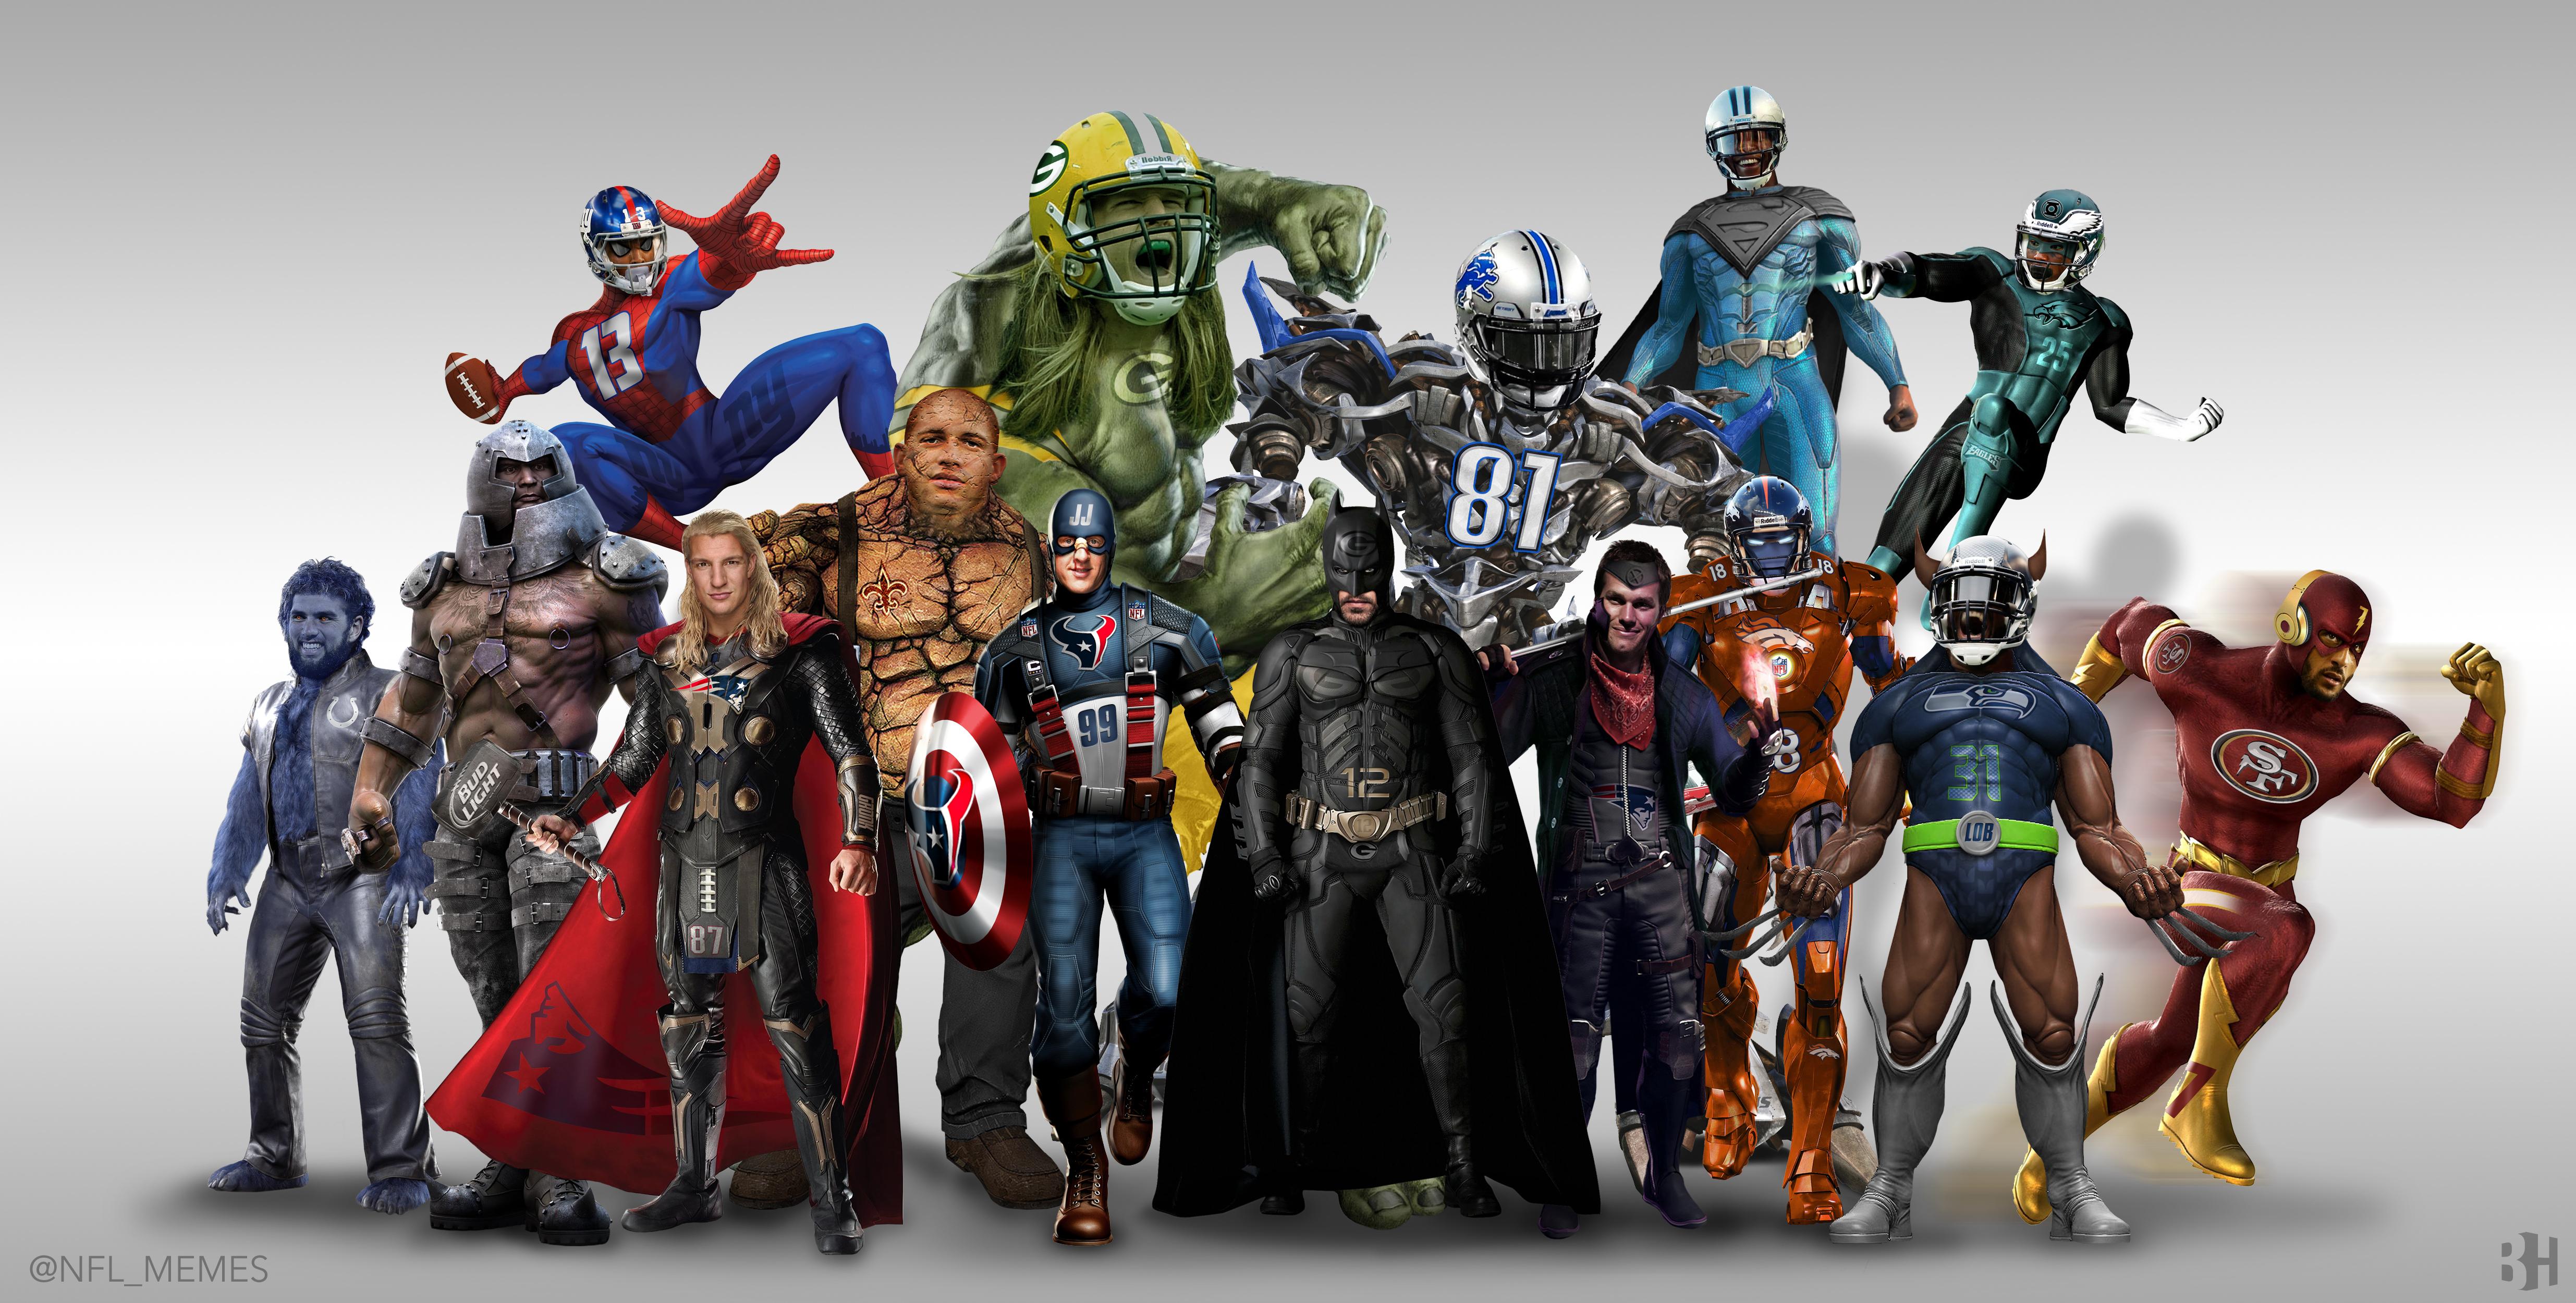 [NFL] 15 giocatori NFL + 1 trasformati in super eroi